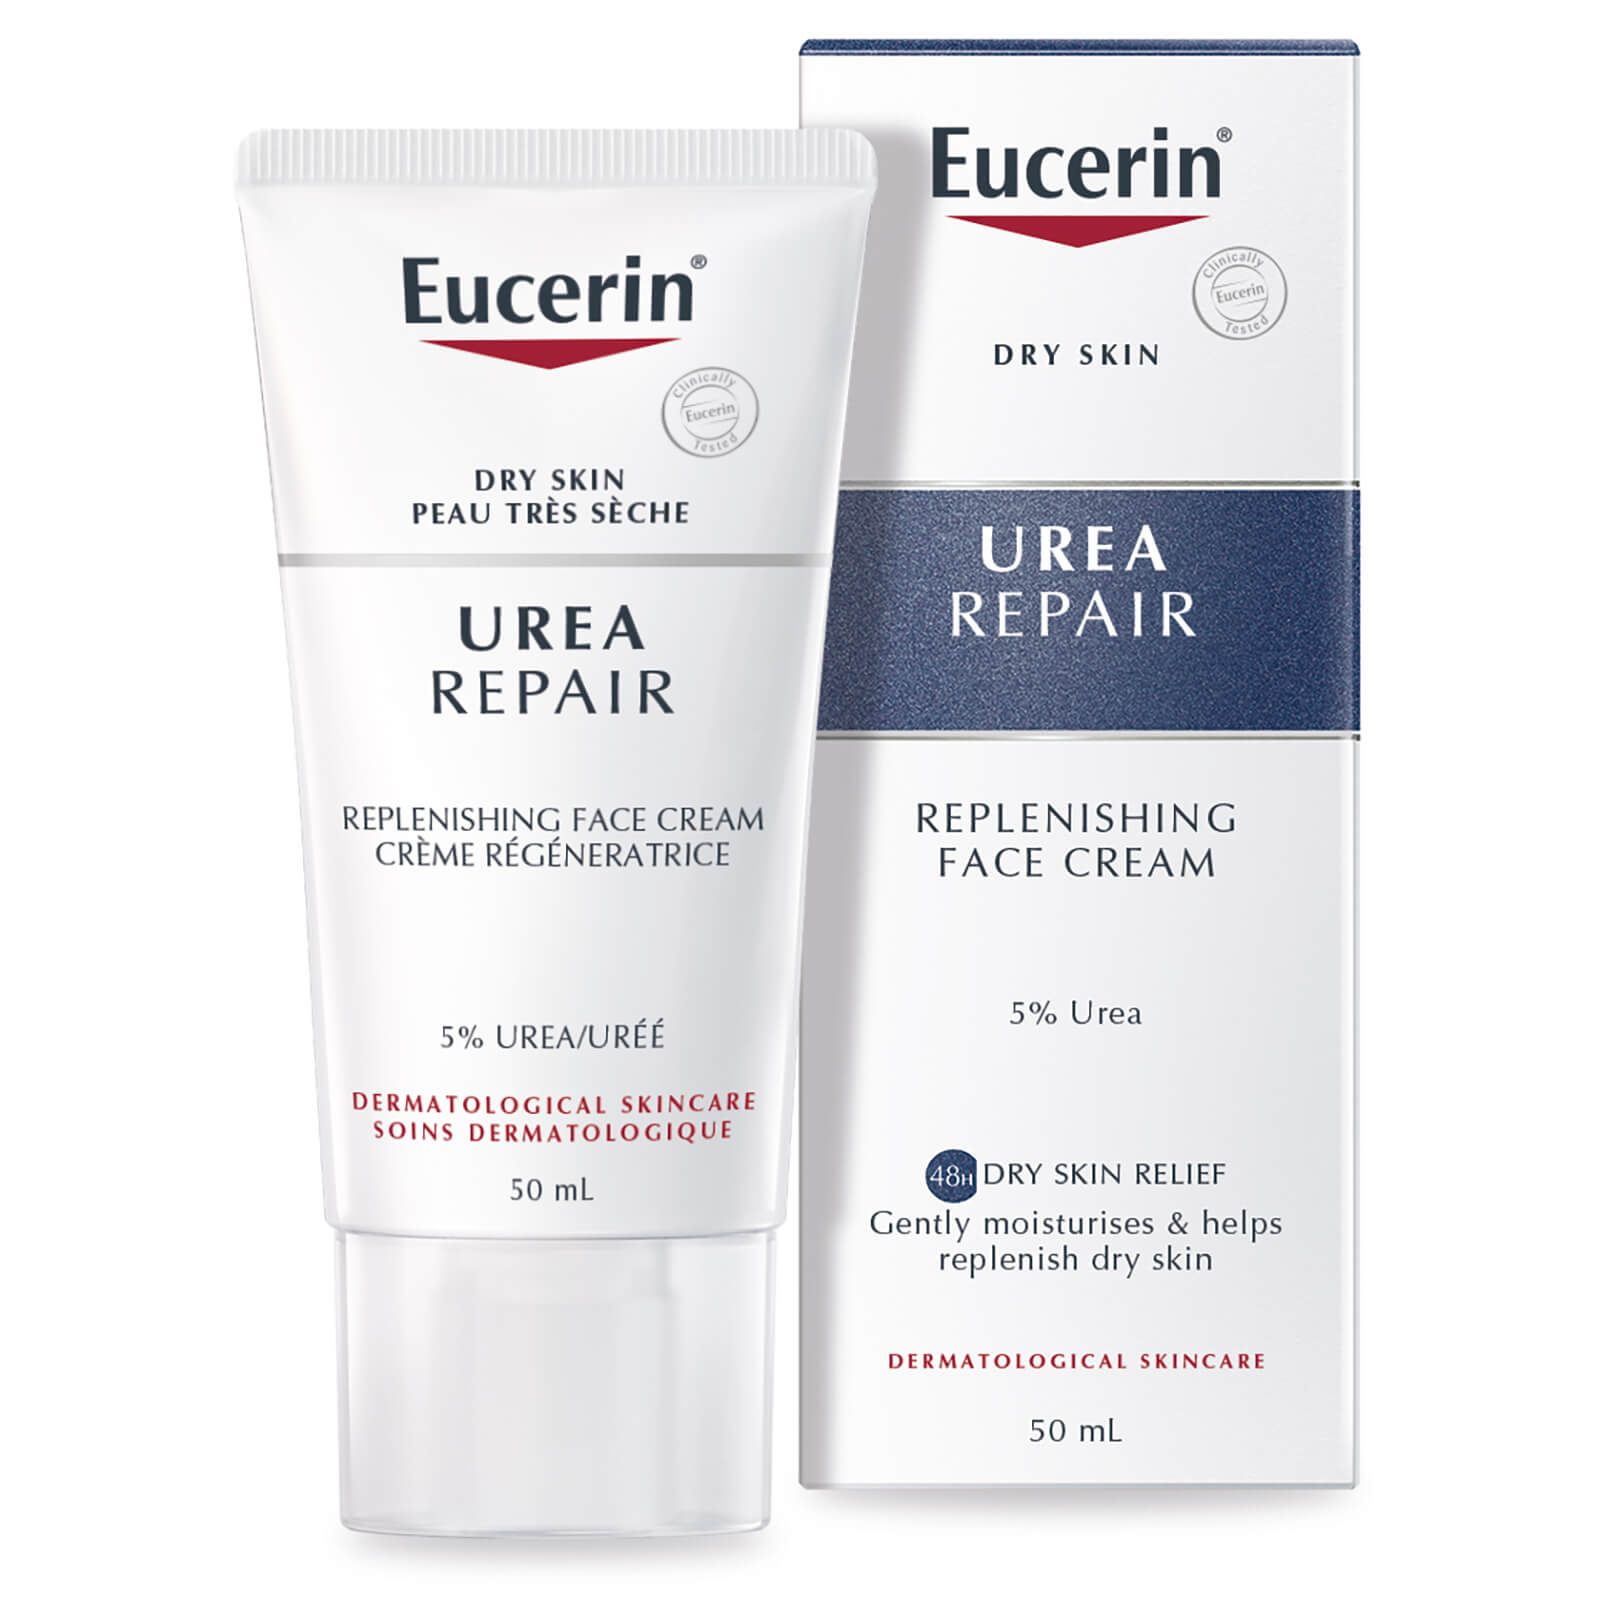 Eucerin Replenishing Face Cream 5% Urea with Lactate </div>                                   </div> </div>       </div>         <div style=